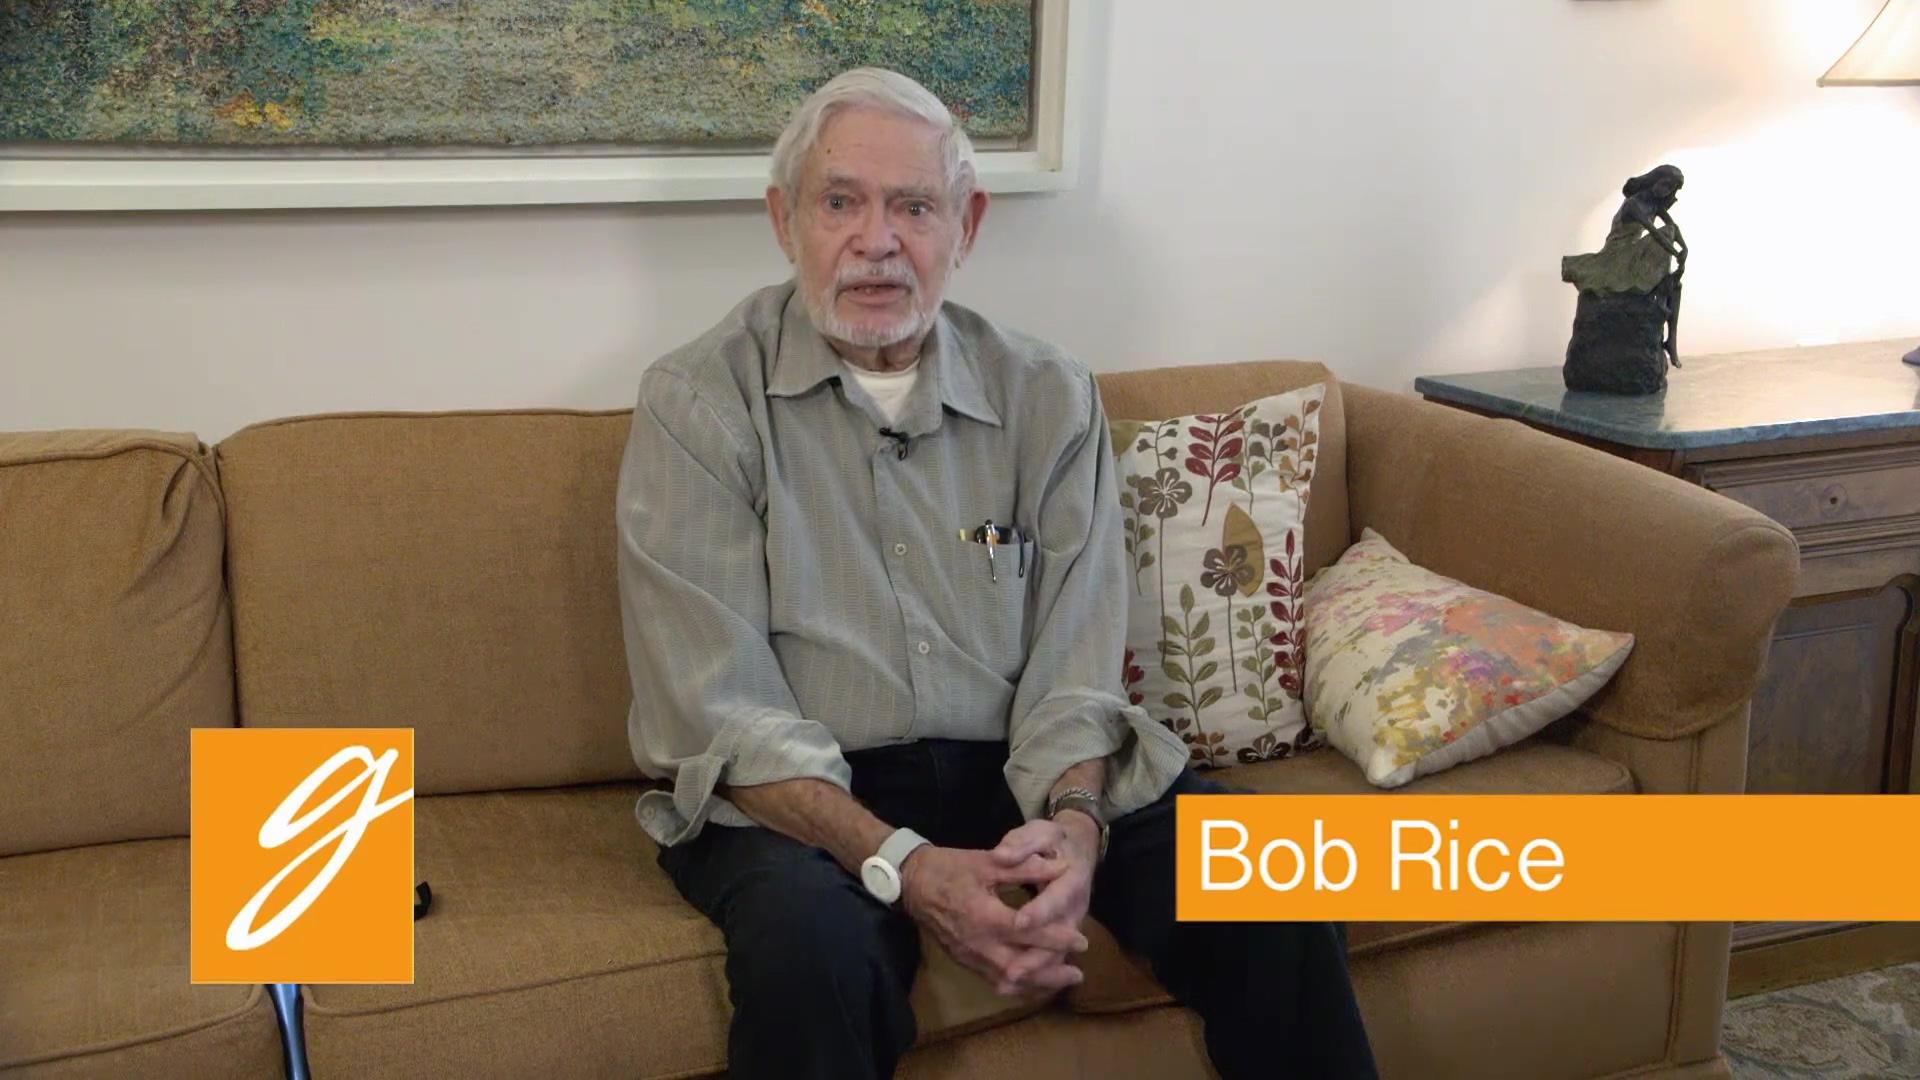 Bob Rice Testimonial